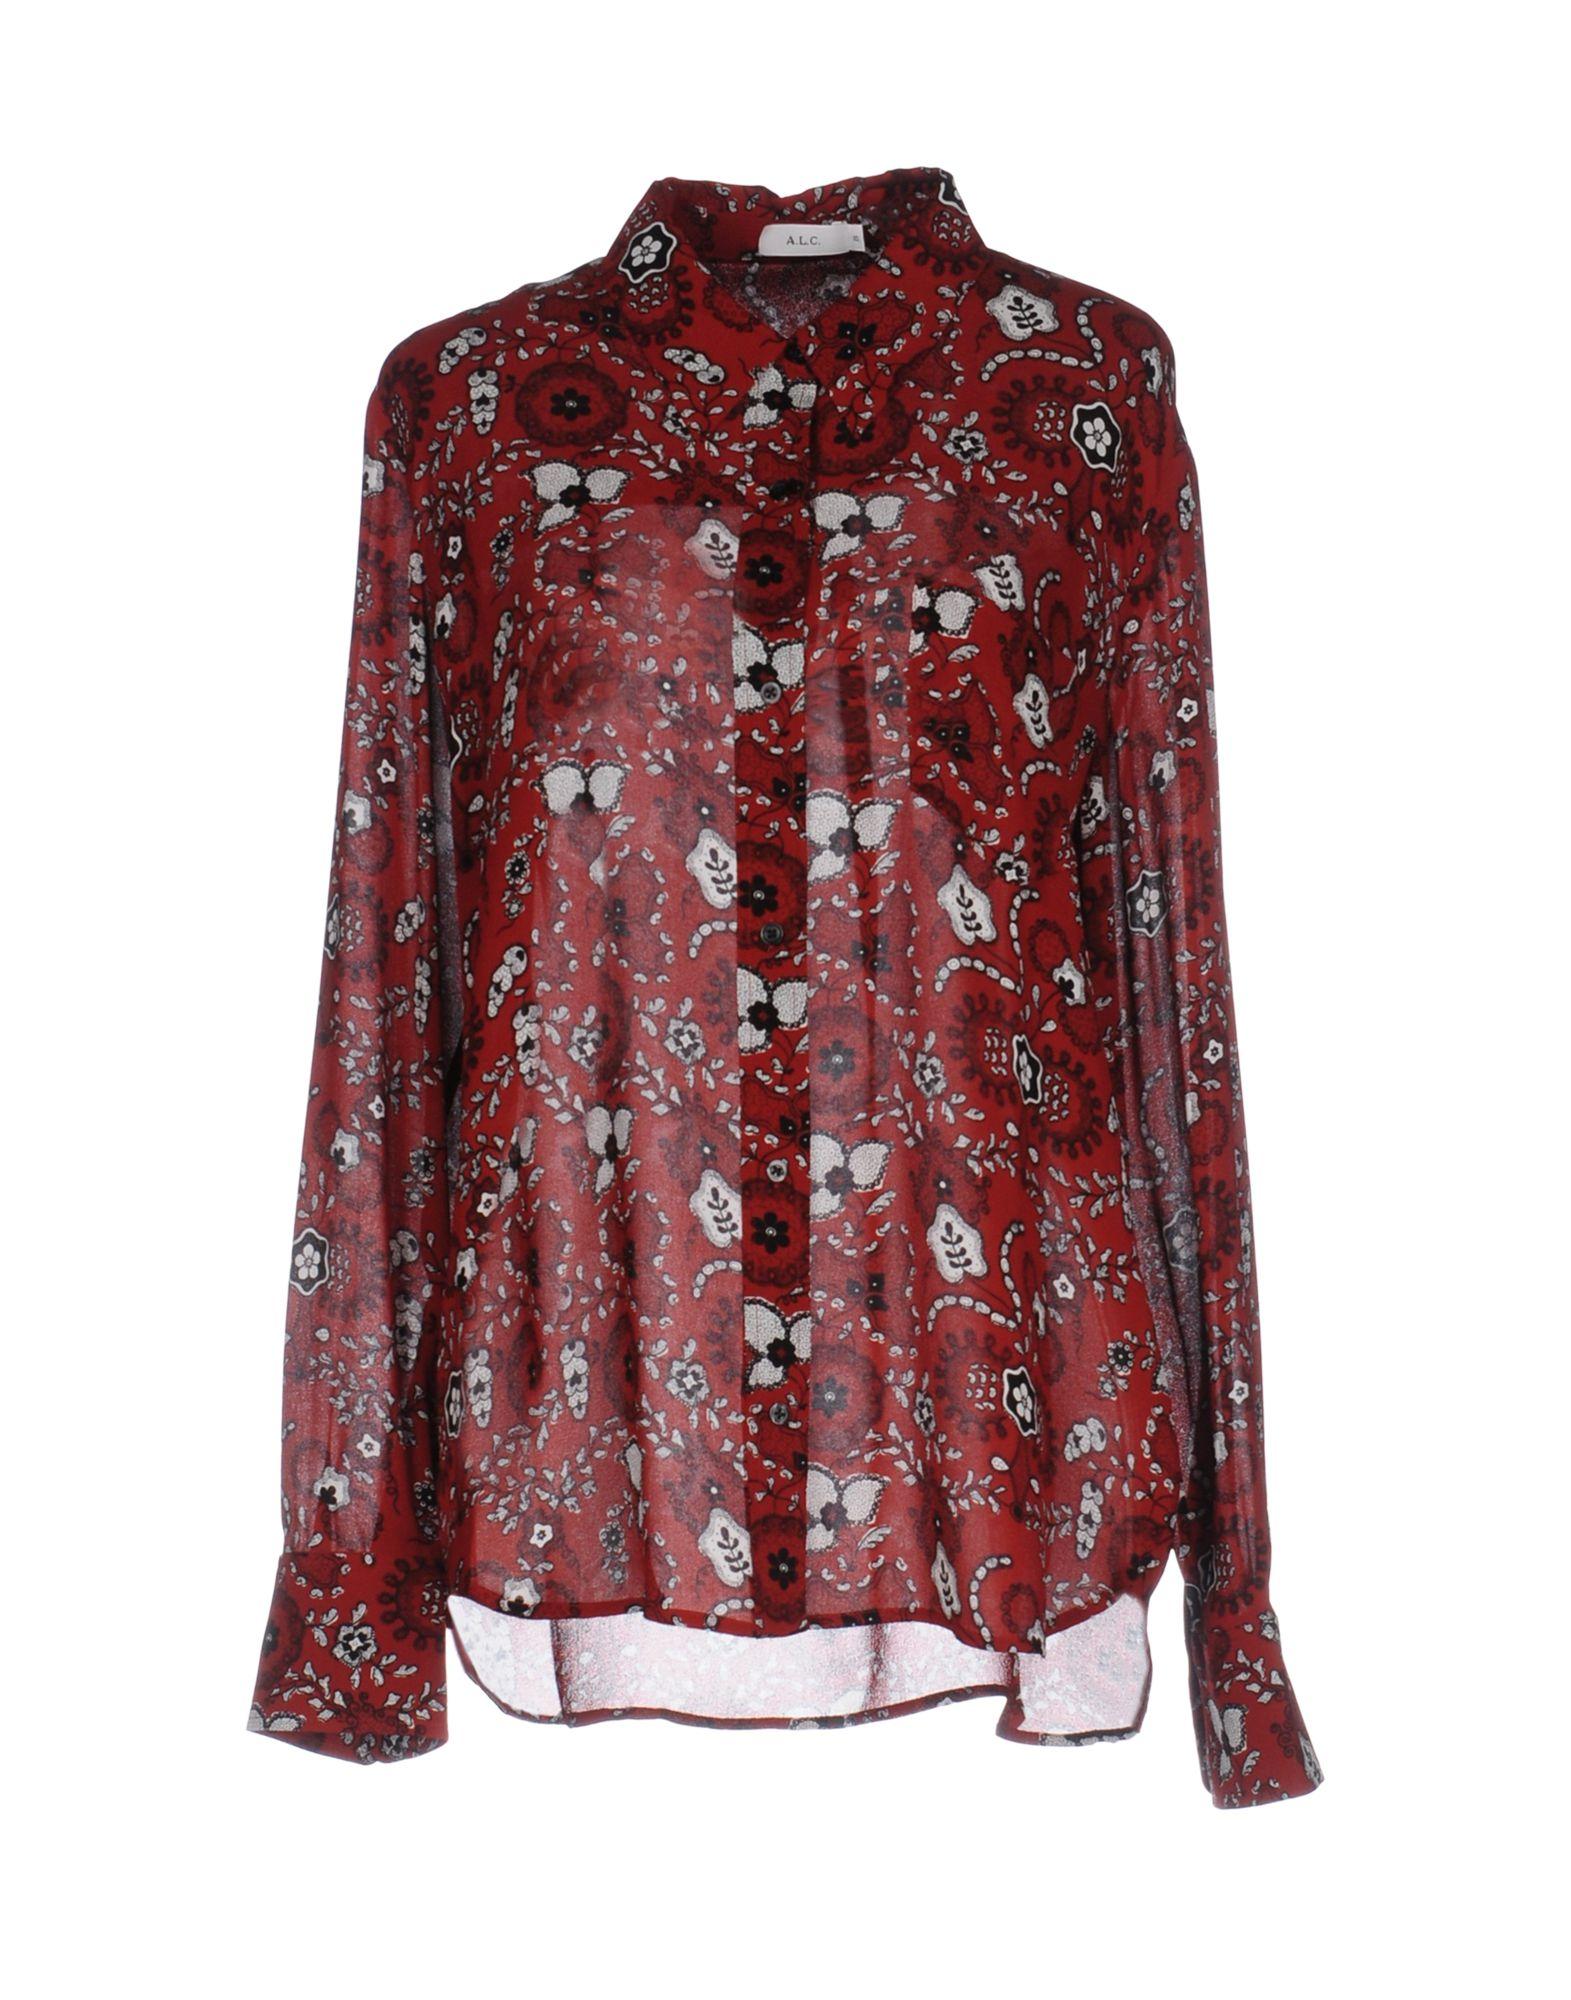 A.L.C. Damen Hemd Farbe Ziegelrot Größe 6 jetztbilligerkaufen